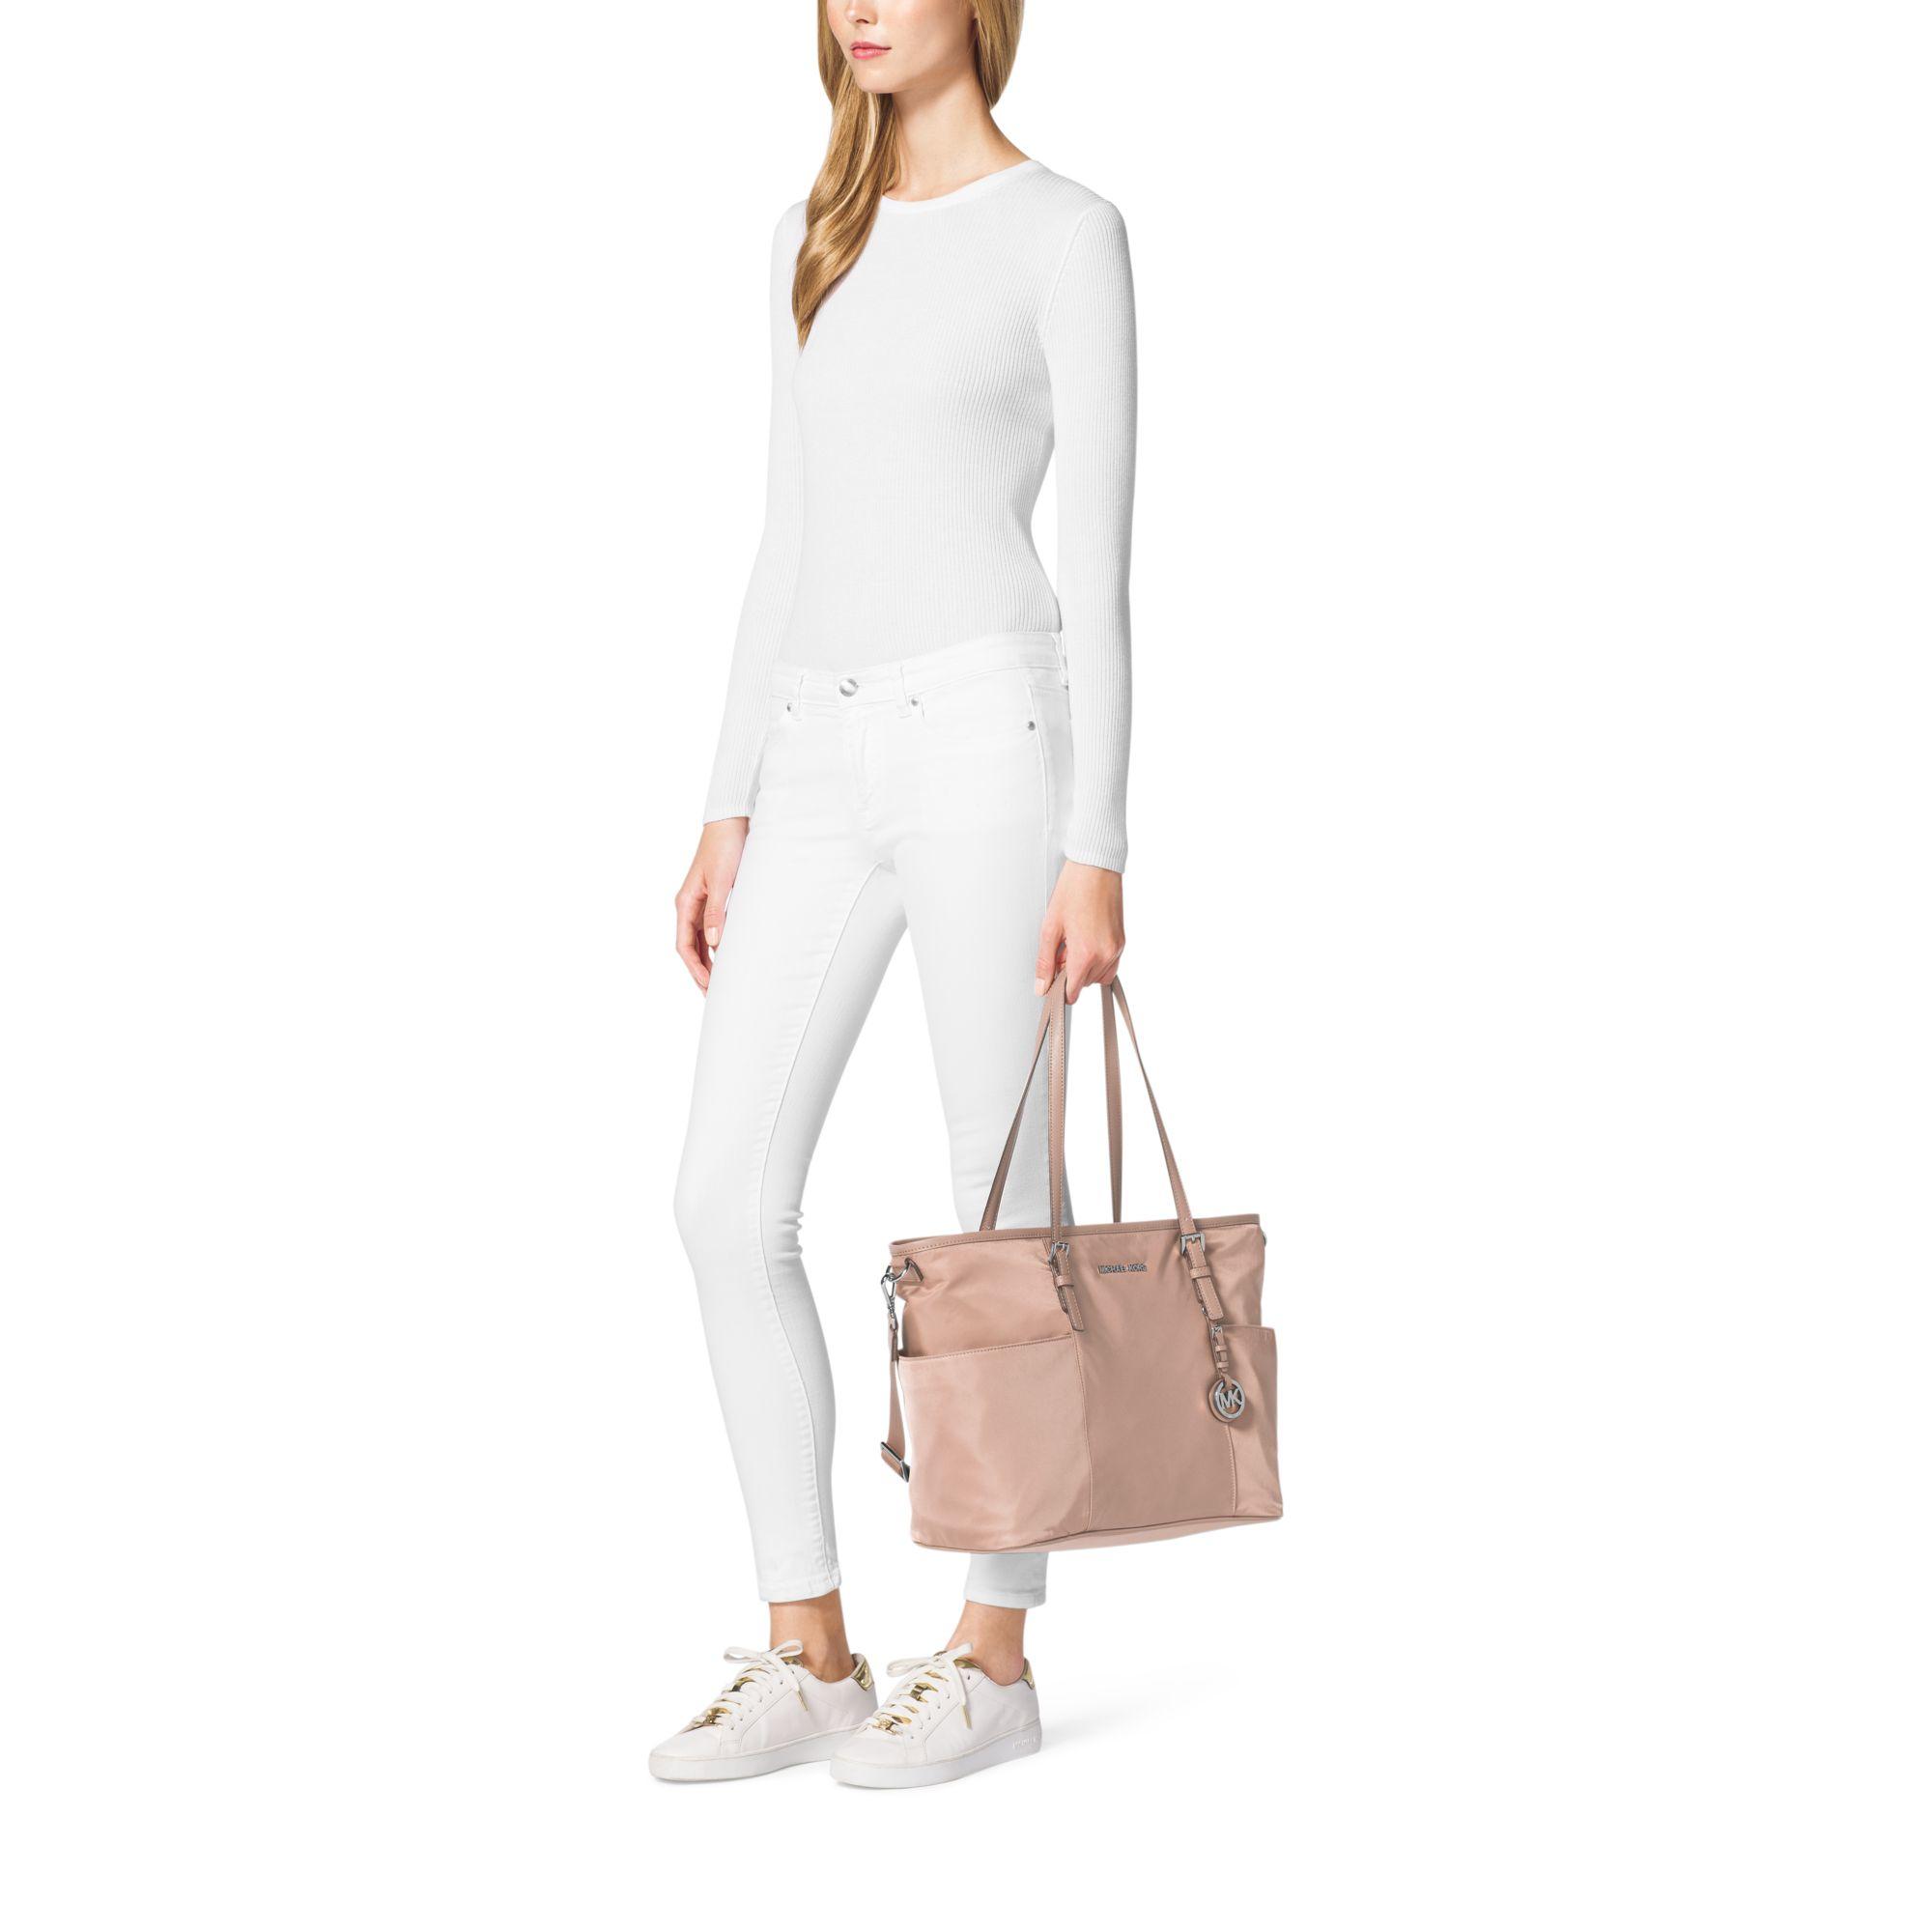 4538bc3303a1 Michael Kors Jet Set Large Nylon Backpack With Leather Straps- Fenix ...